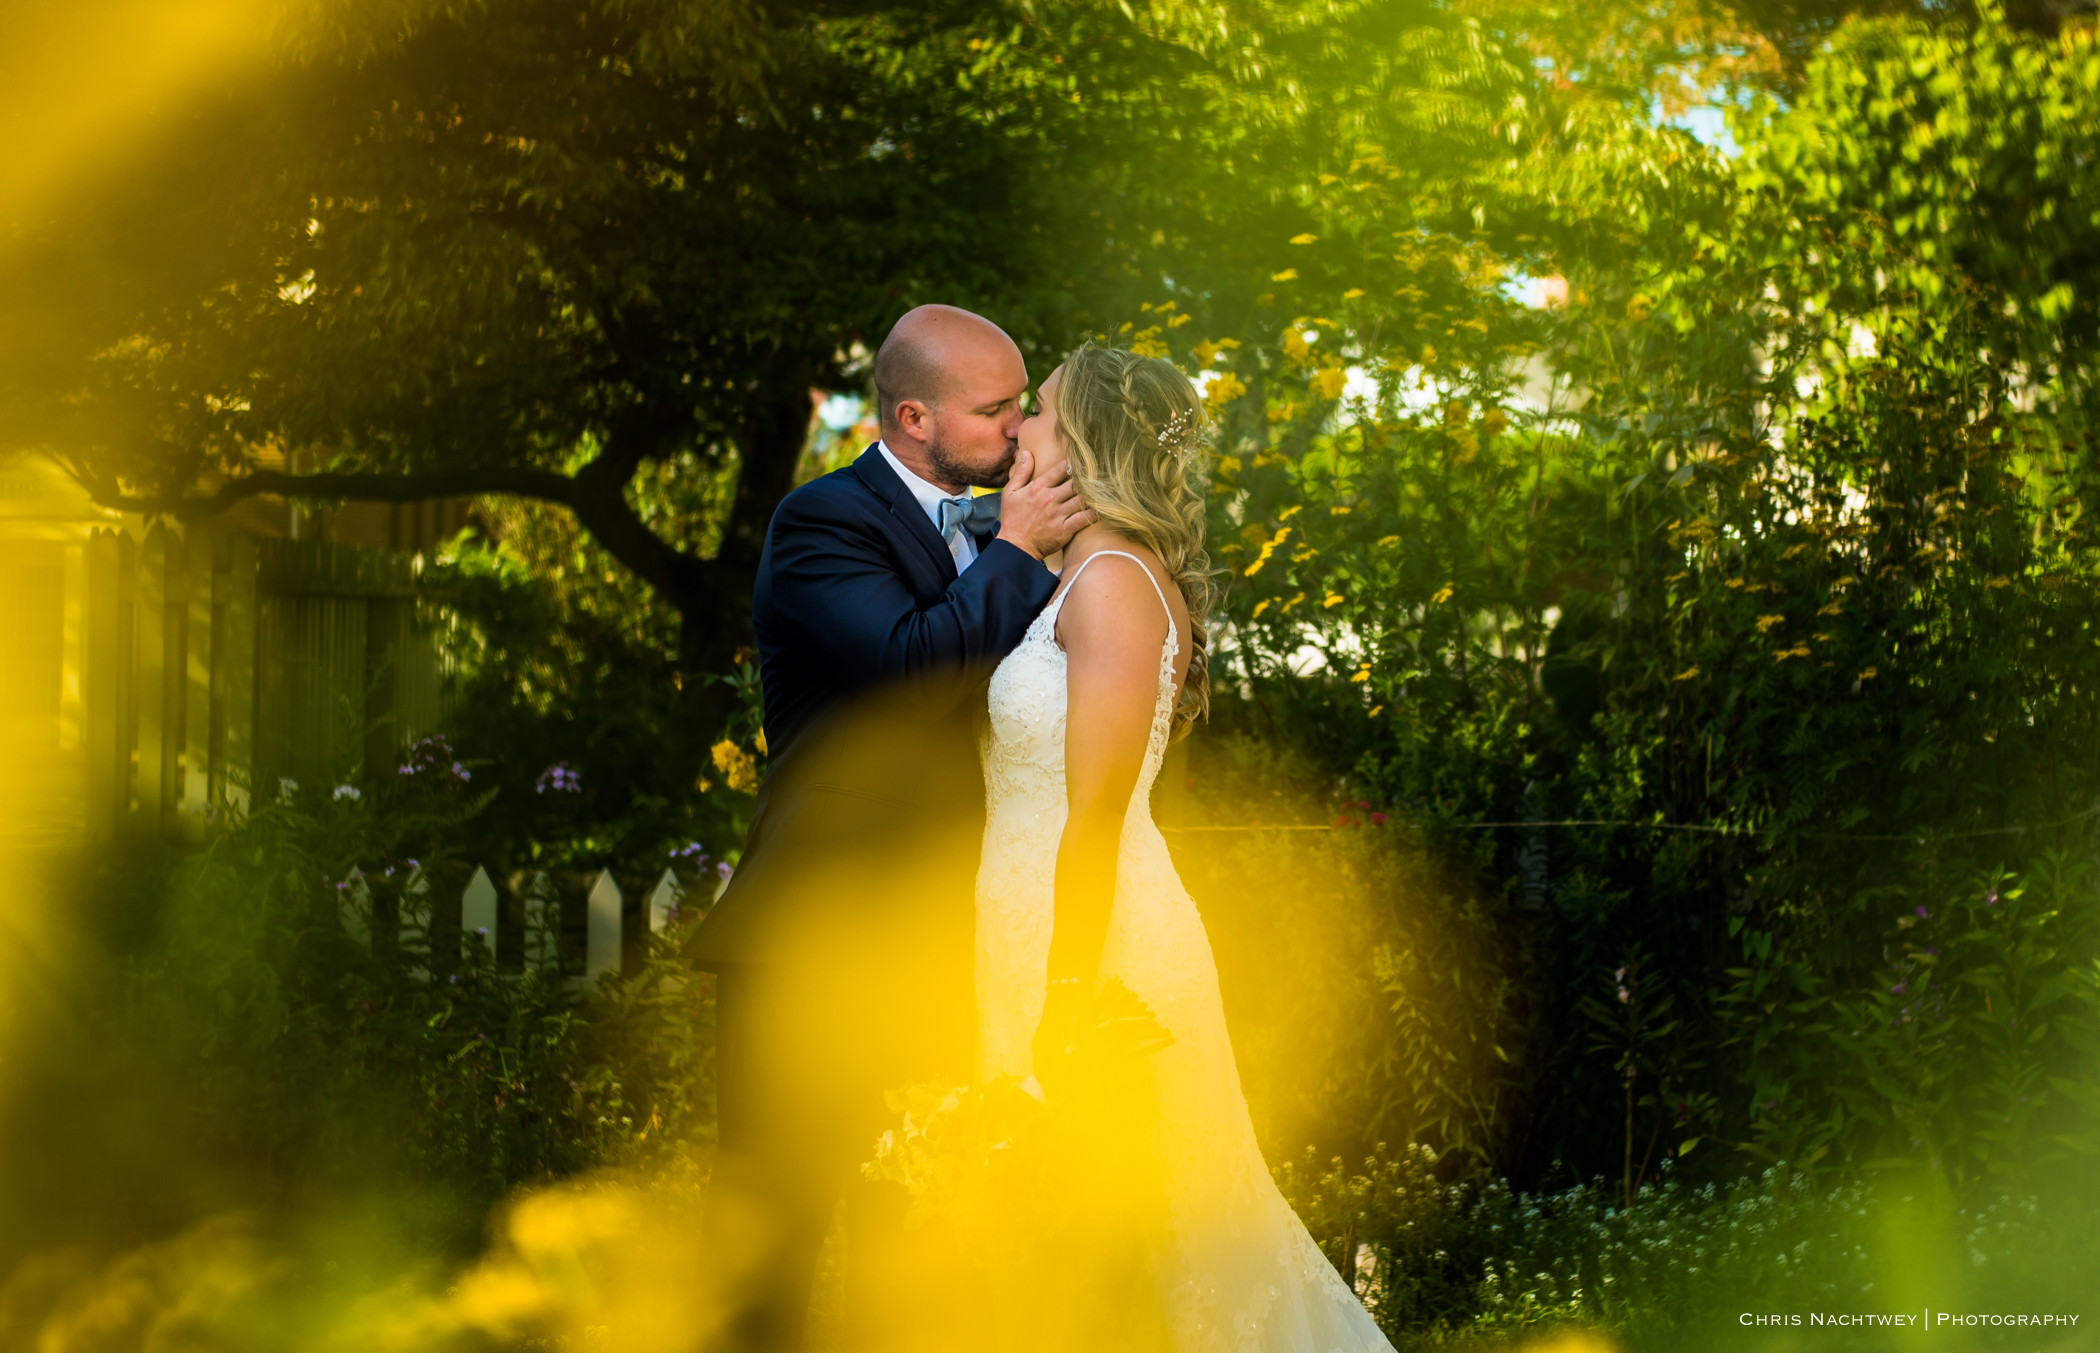 mystic-ct-artistic-wedding-photographers-chris-nachtwey-tany-mike-2017-22.jpg